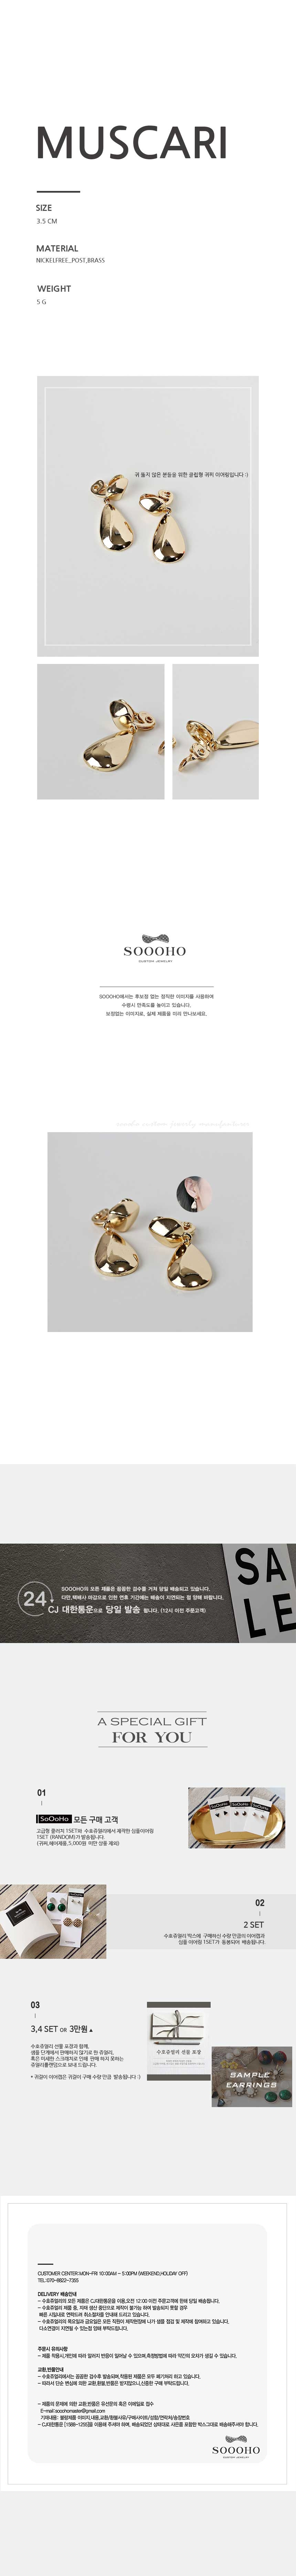 muscari 골드 클립형 귀찌귀걸이 - 수호쥬얼리, 15,500원, 골드, 드롭귀걸이